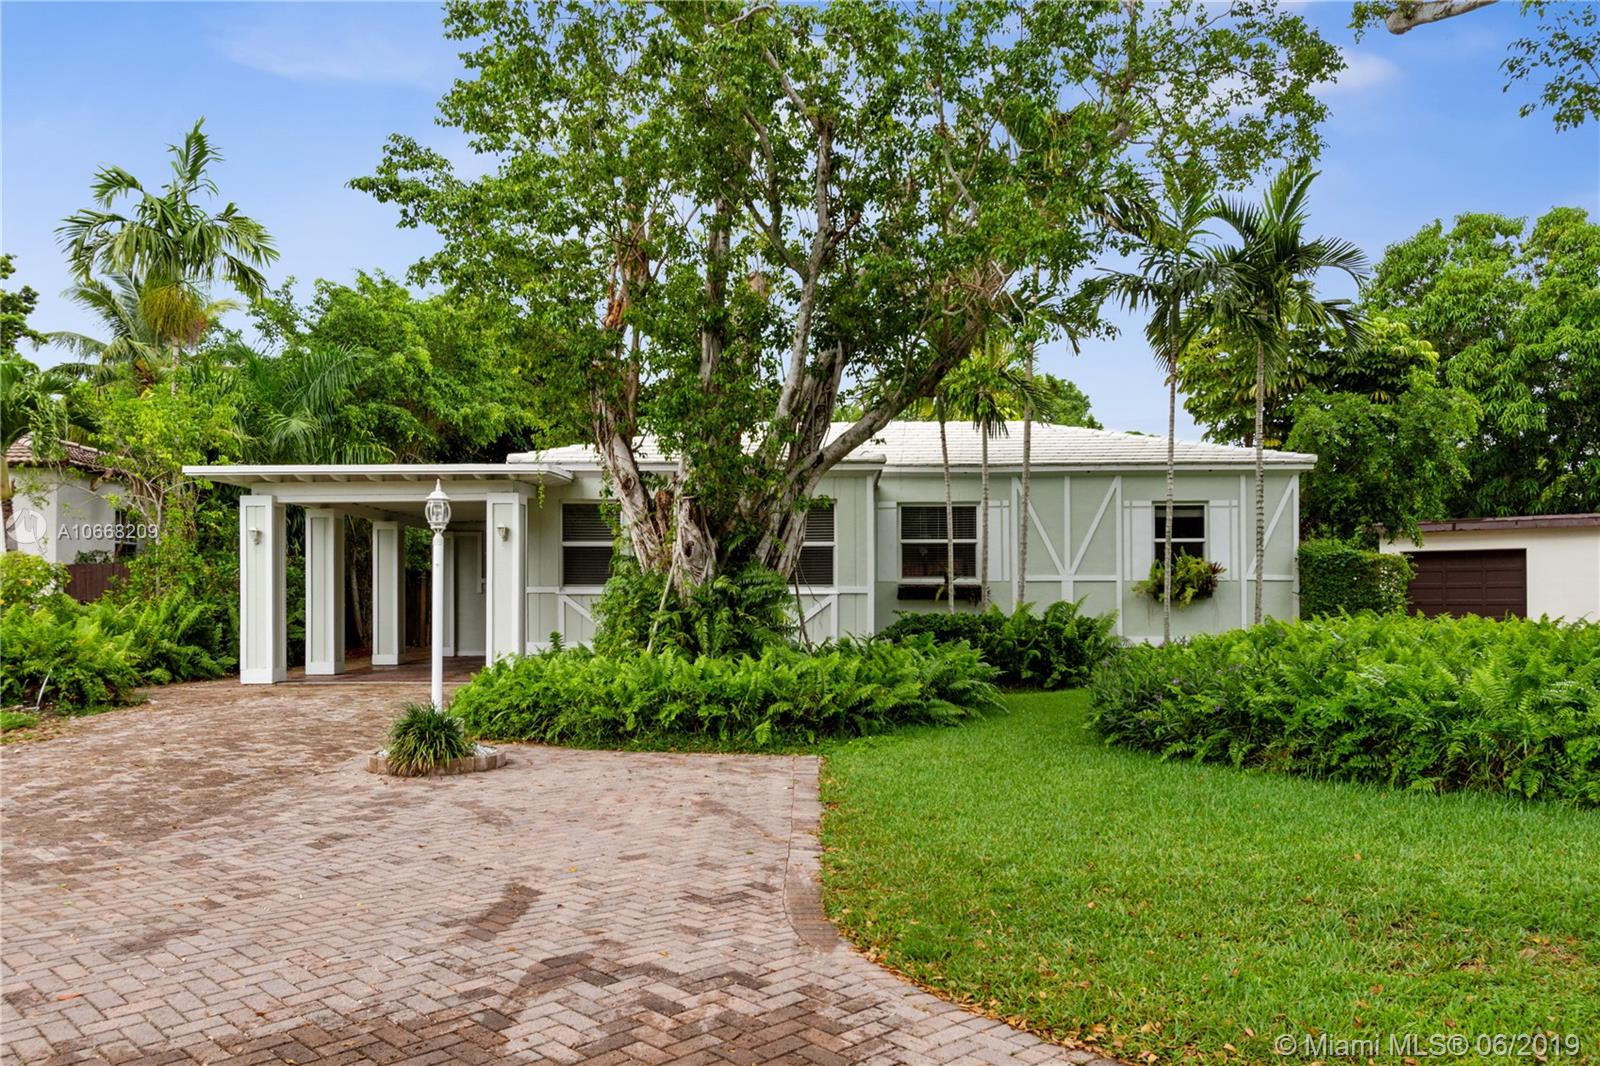 141 NW 88th St, Miami Shores, Florida